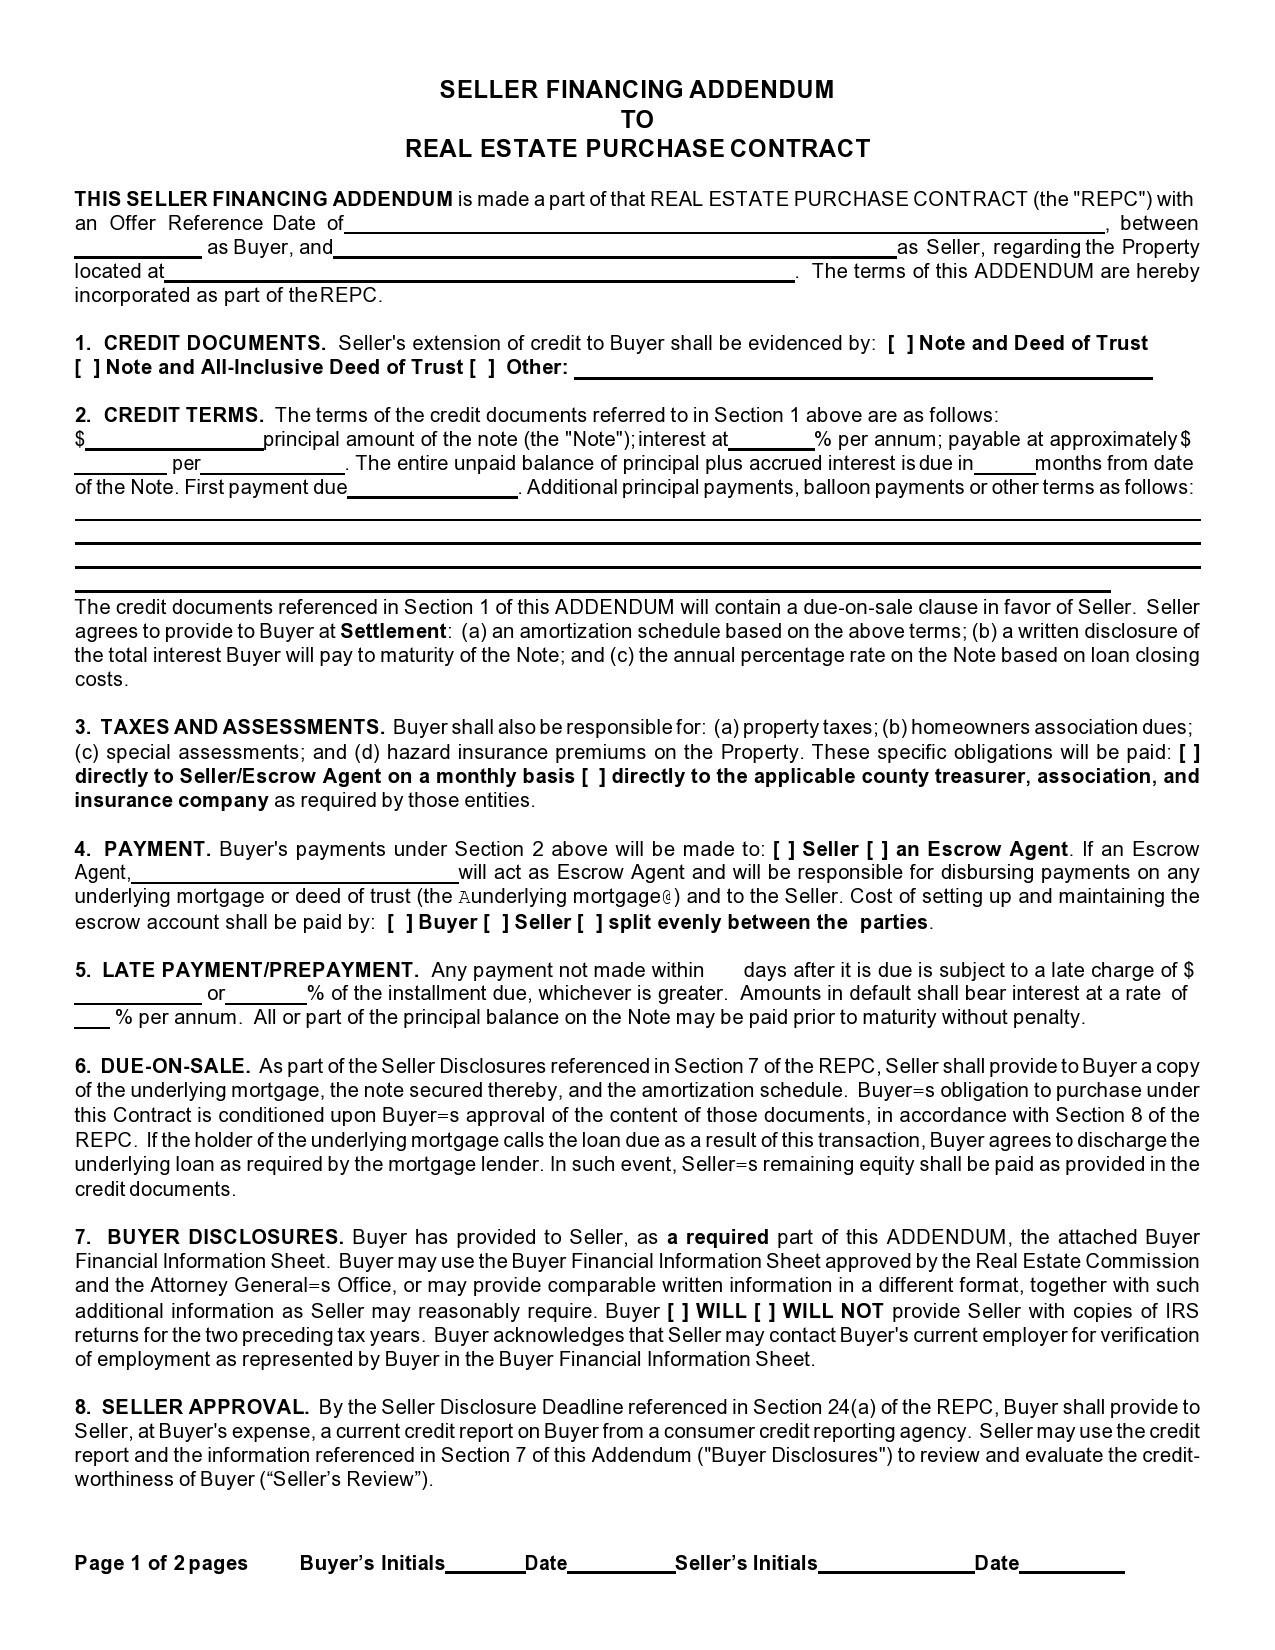 Free seller financing addendum 02